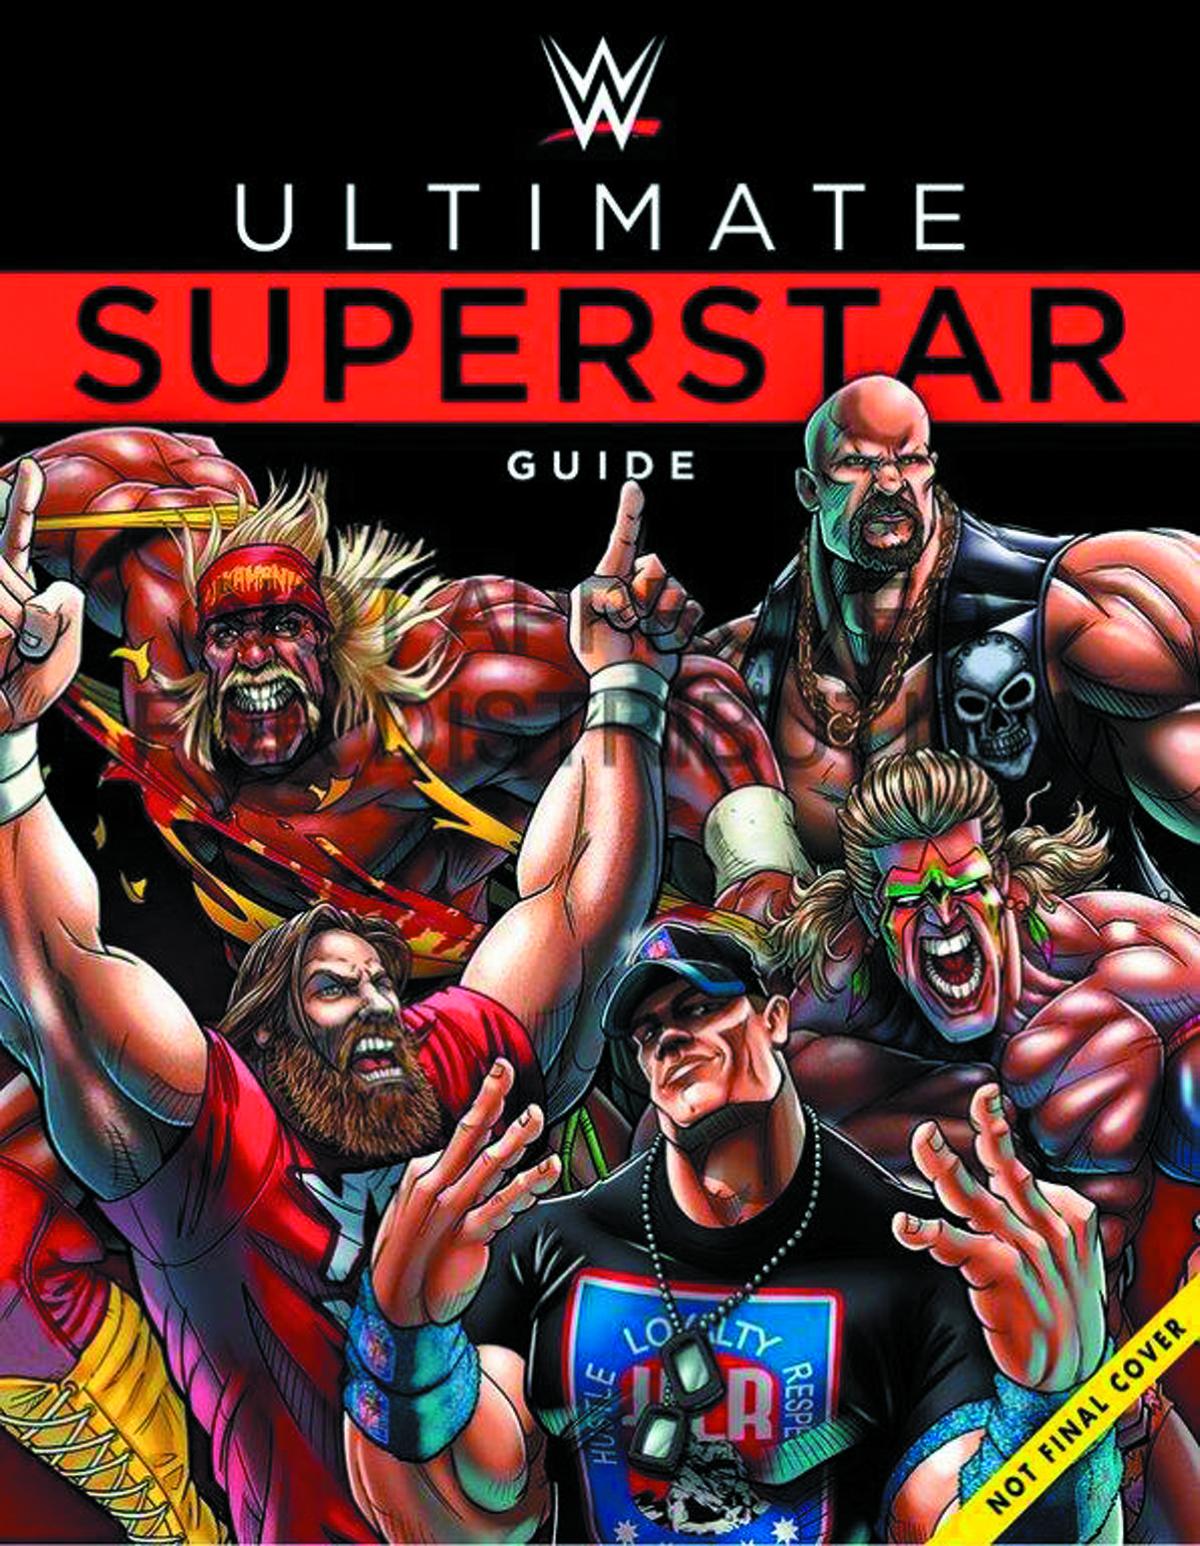 JAN151841 - WWE ULTIMATE SUPERSTAR GUIDE HC - Previews World